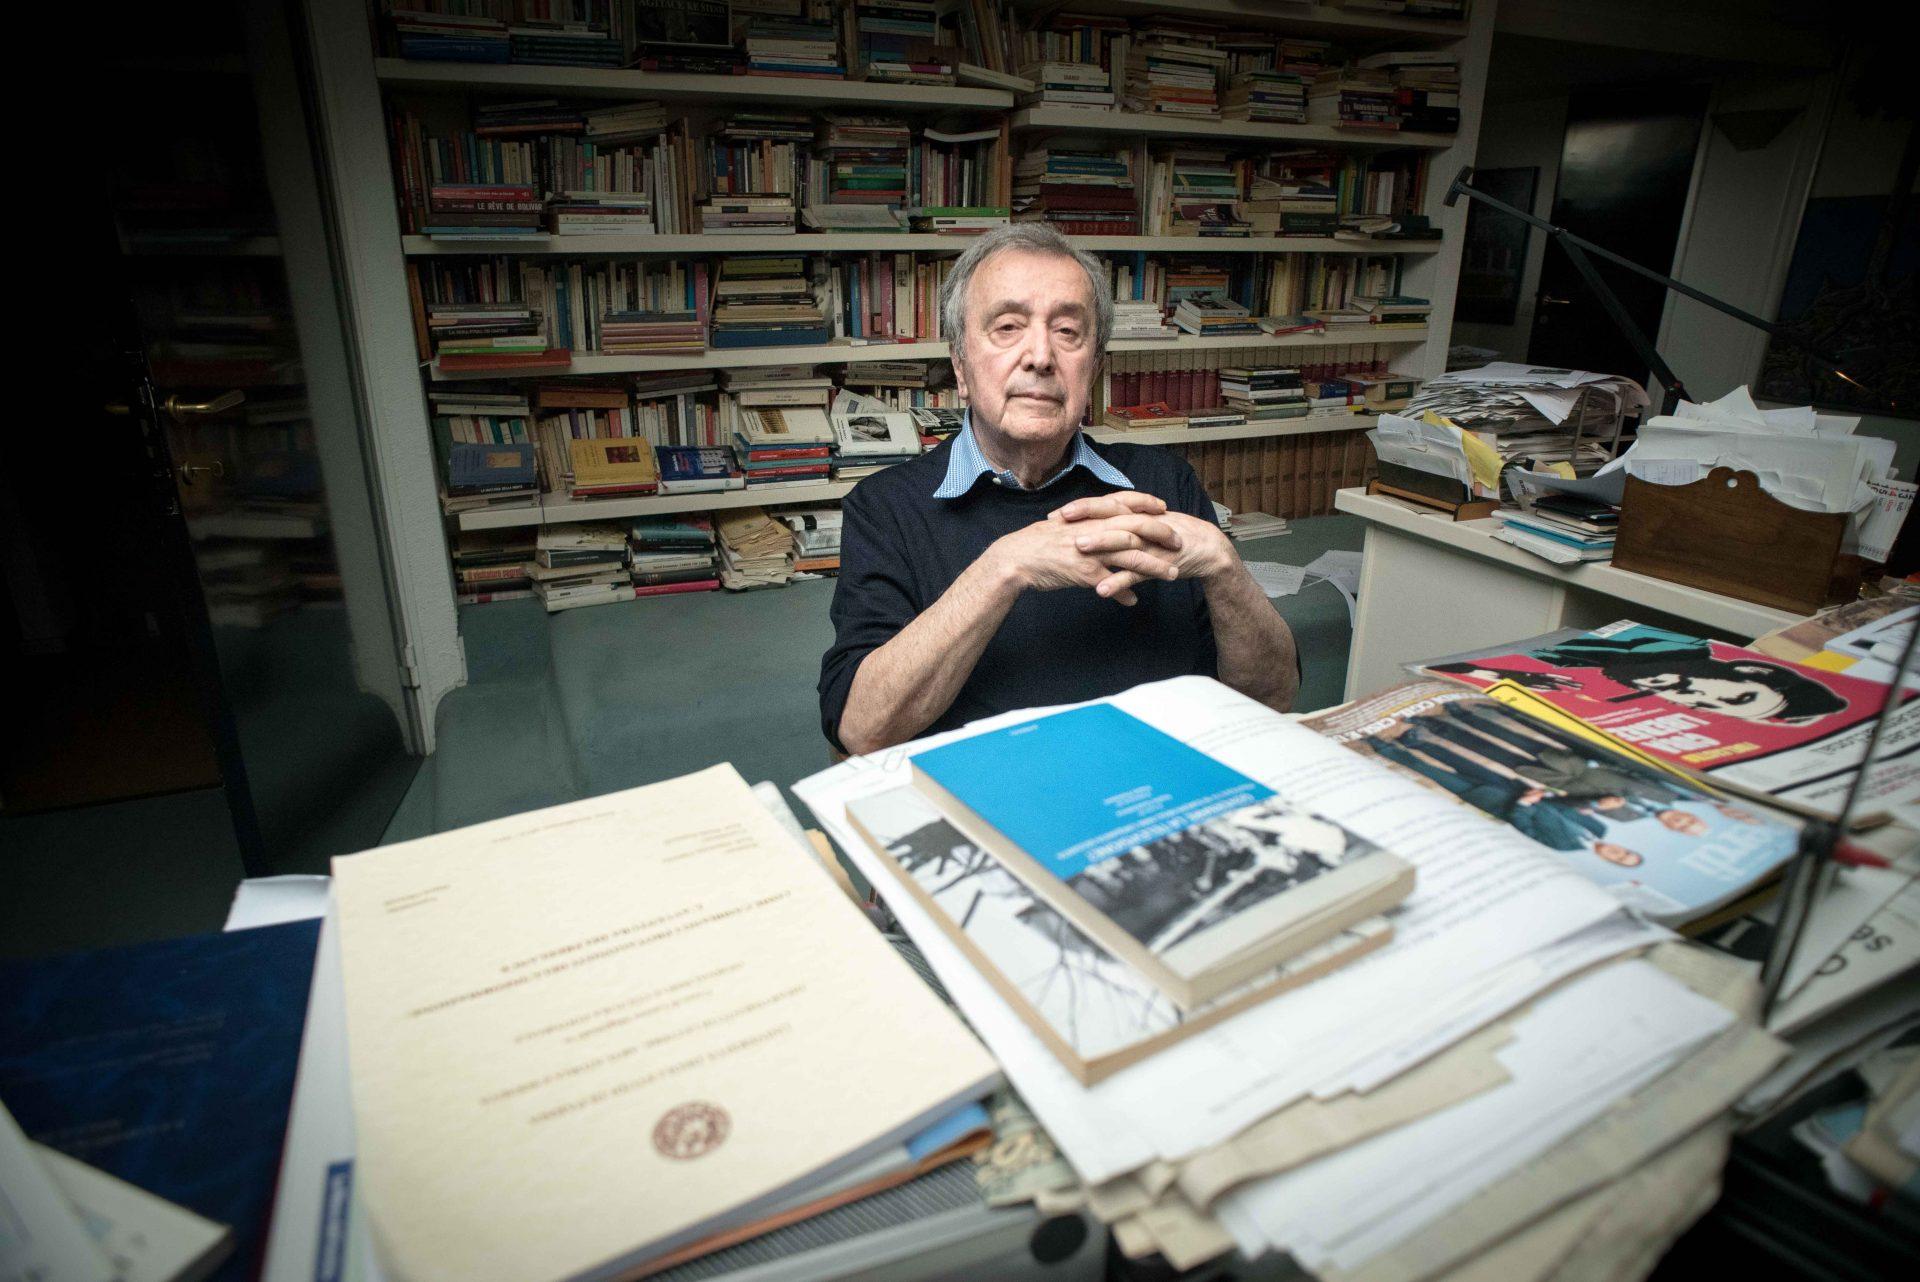 Maurizio Chierici, Parma Italy 2018